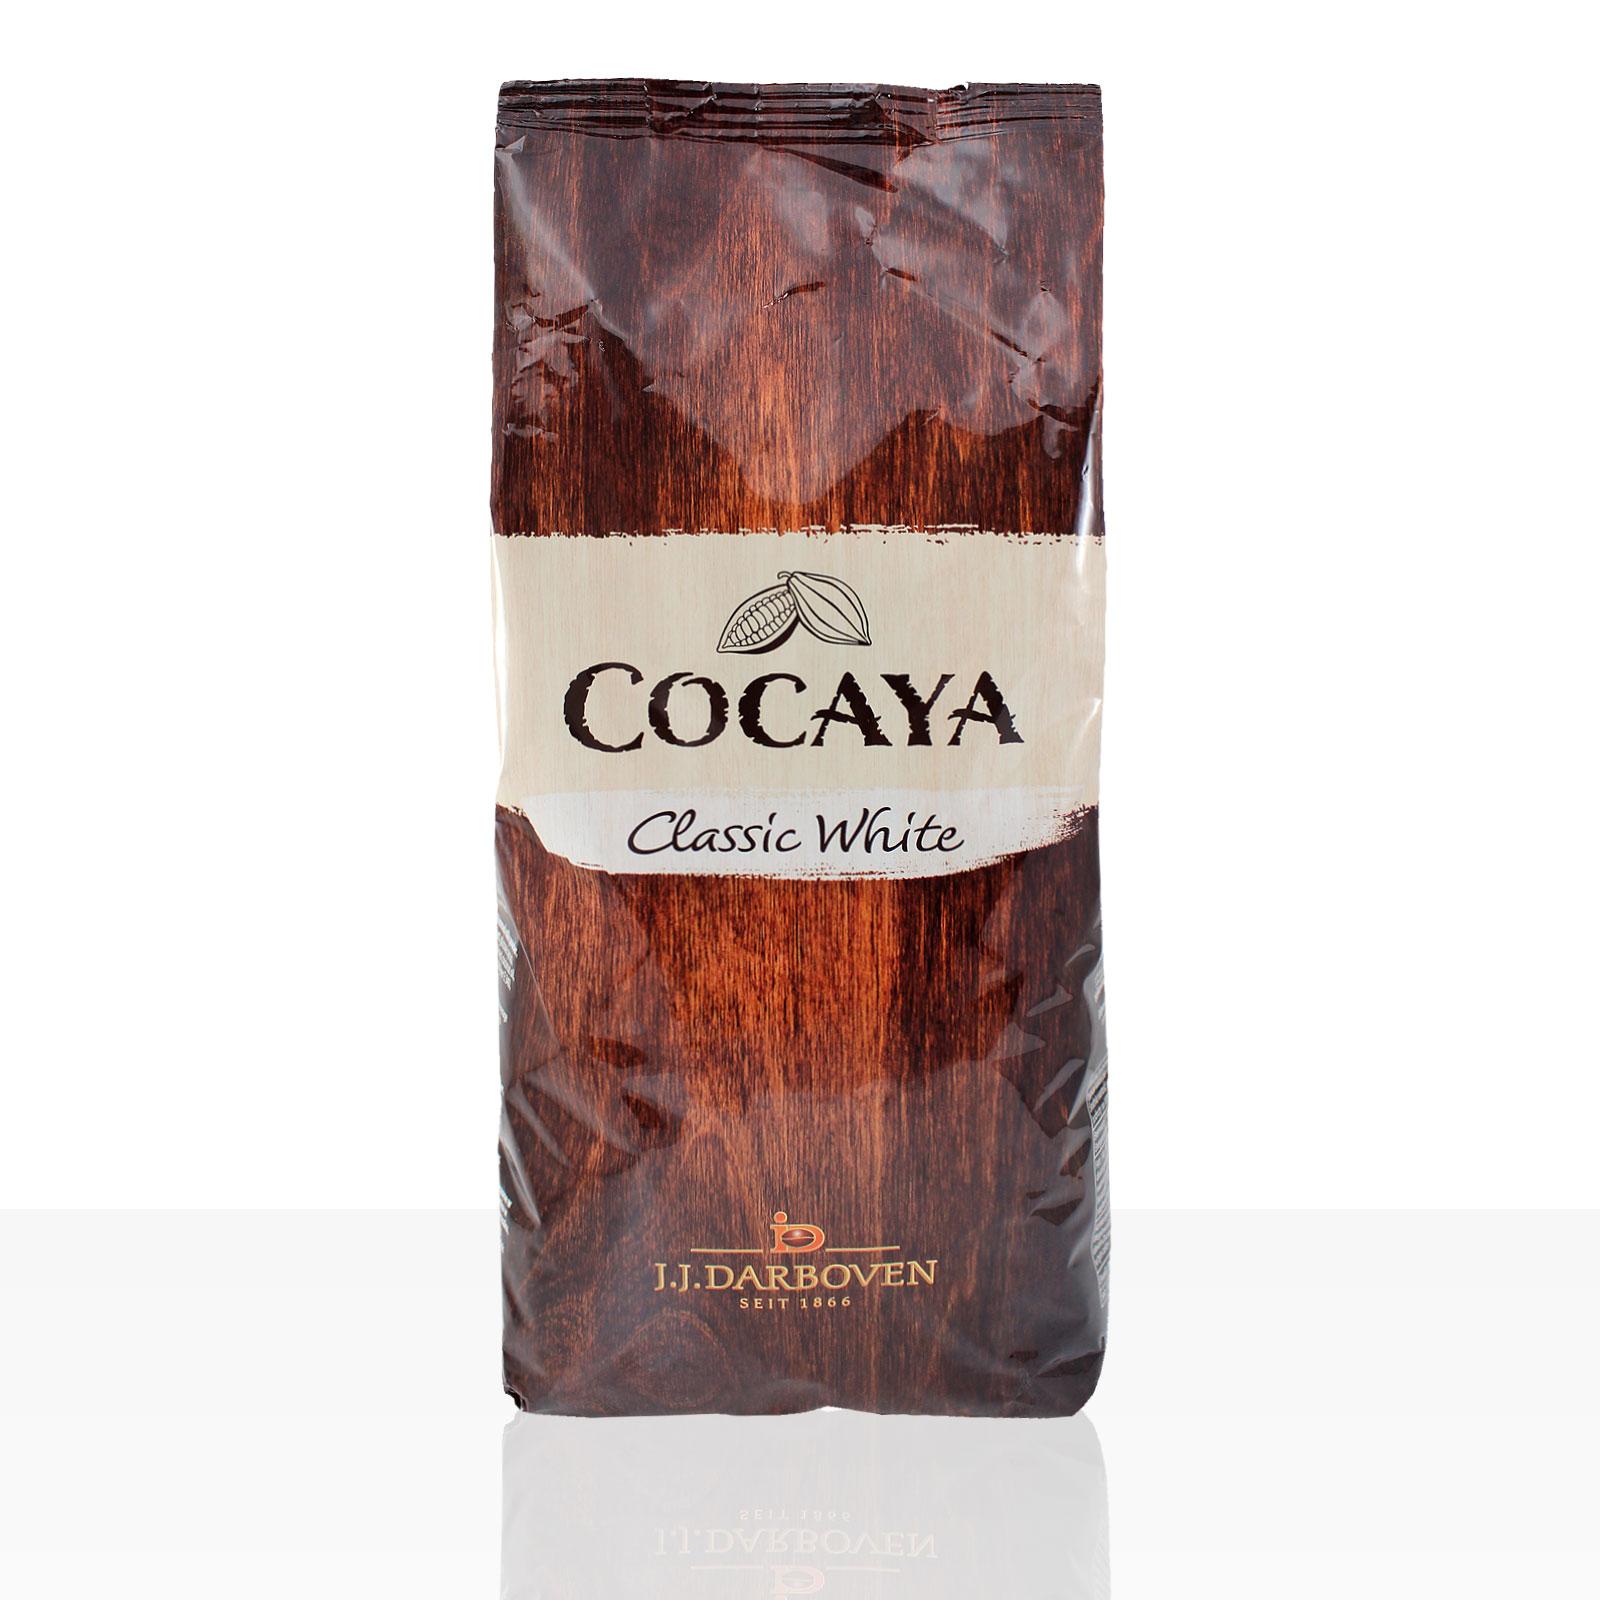 Darboven Cocaya Classic White 10 x 1kg weisse Instantschokolade